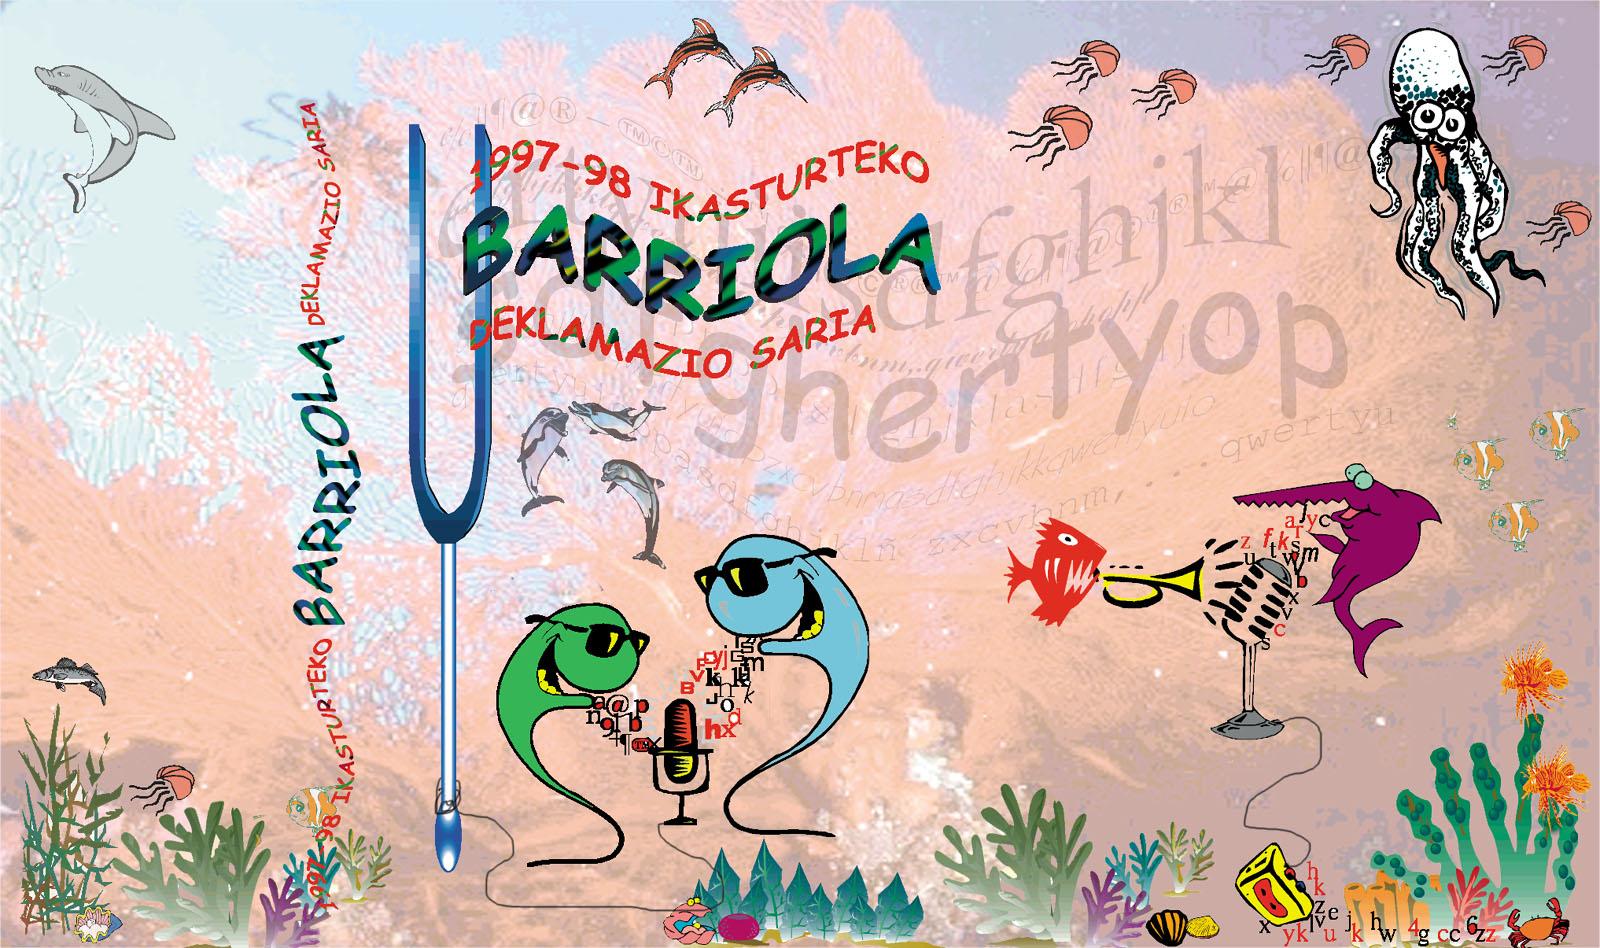 barriola 1998.jpg